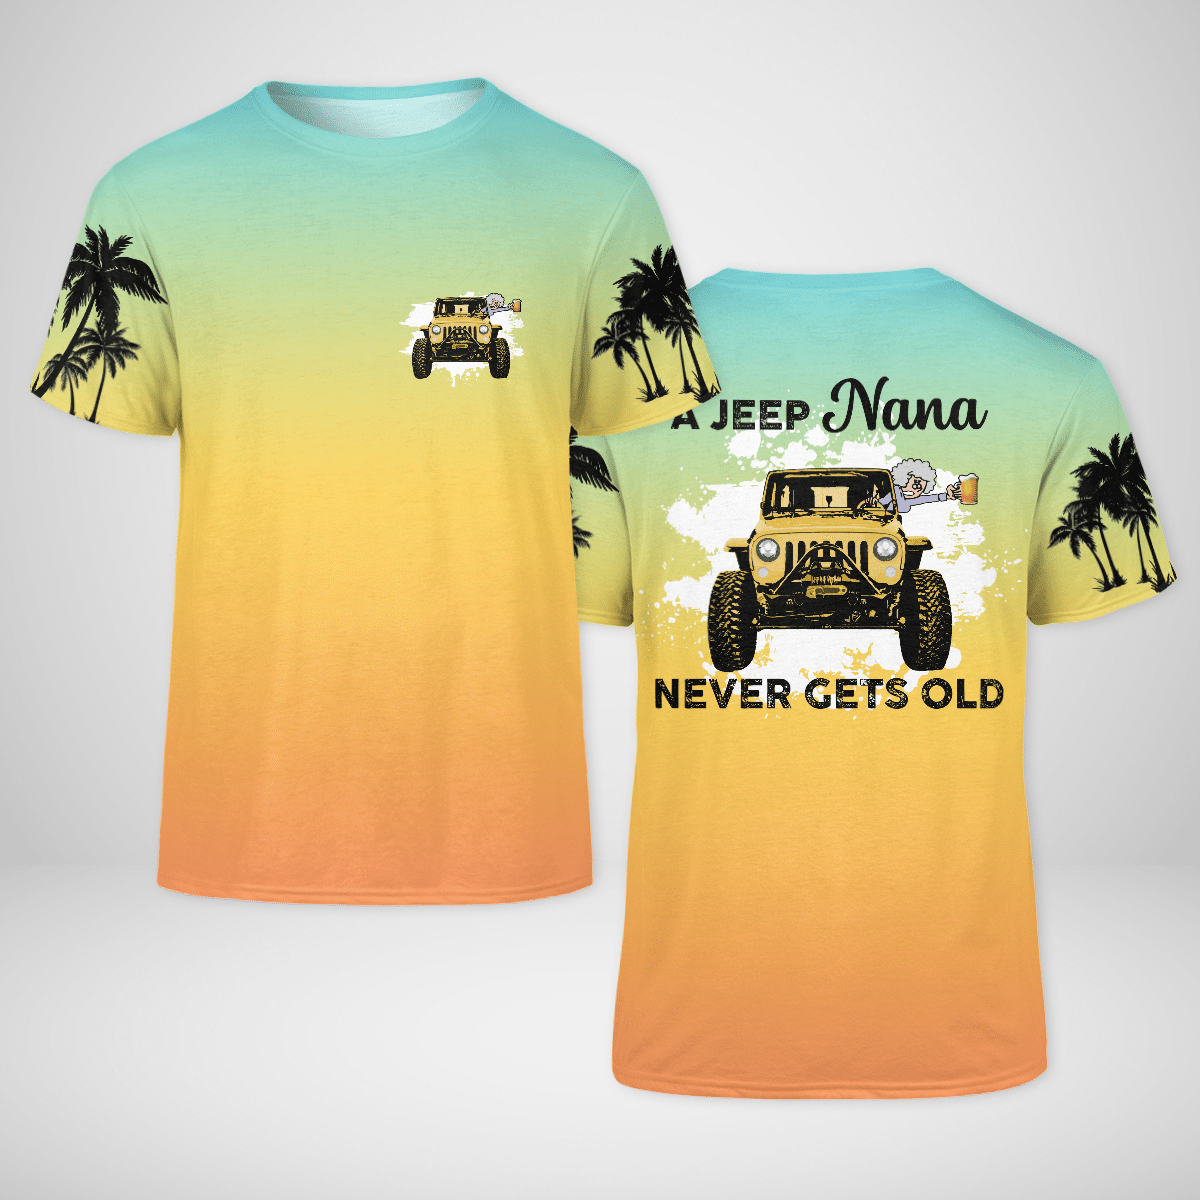 A jeep Nana never gets old 3d T shirt